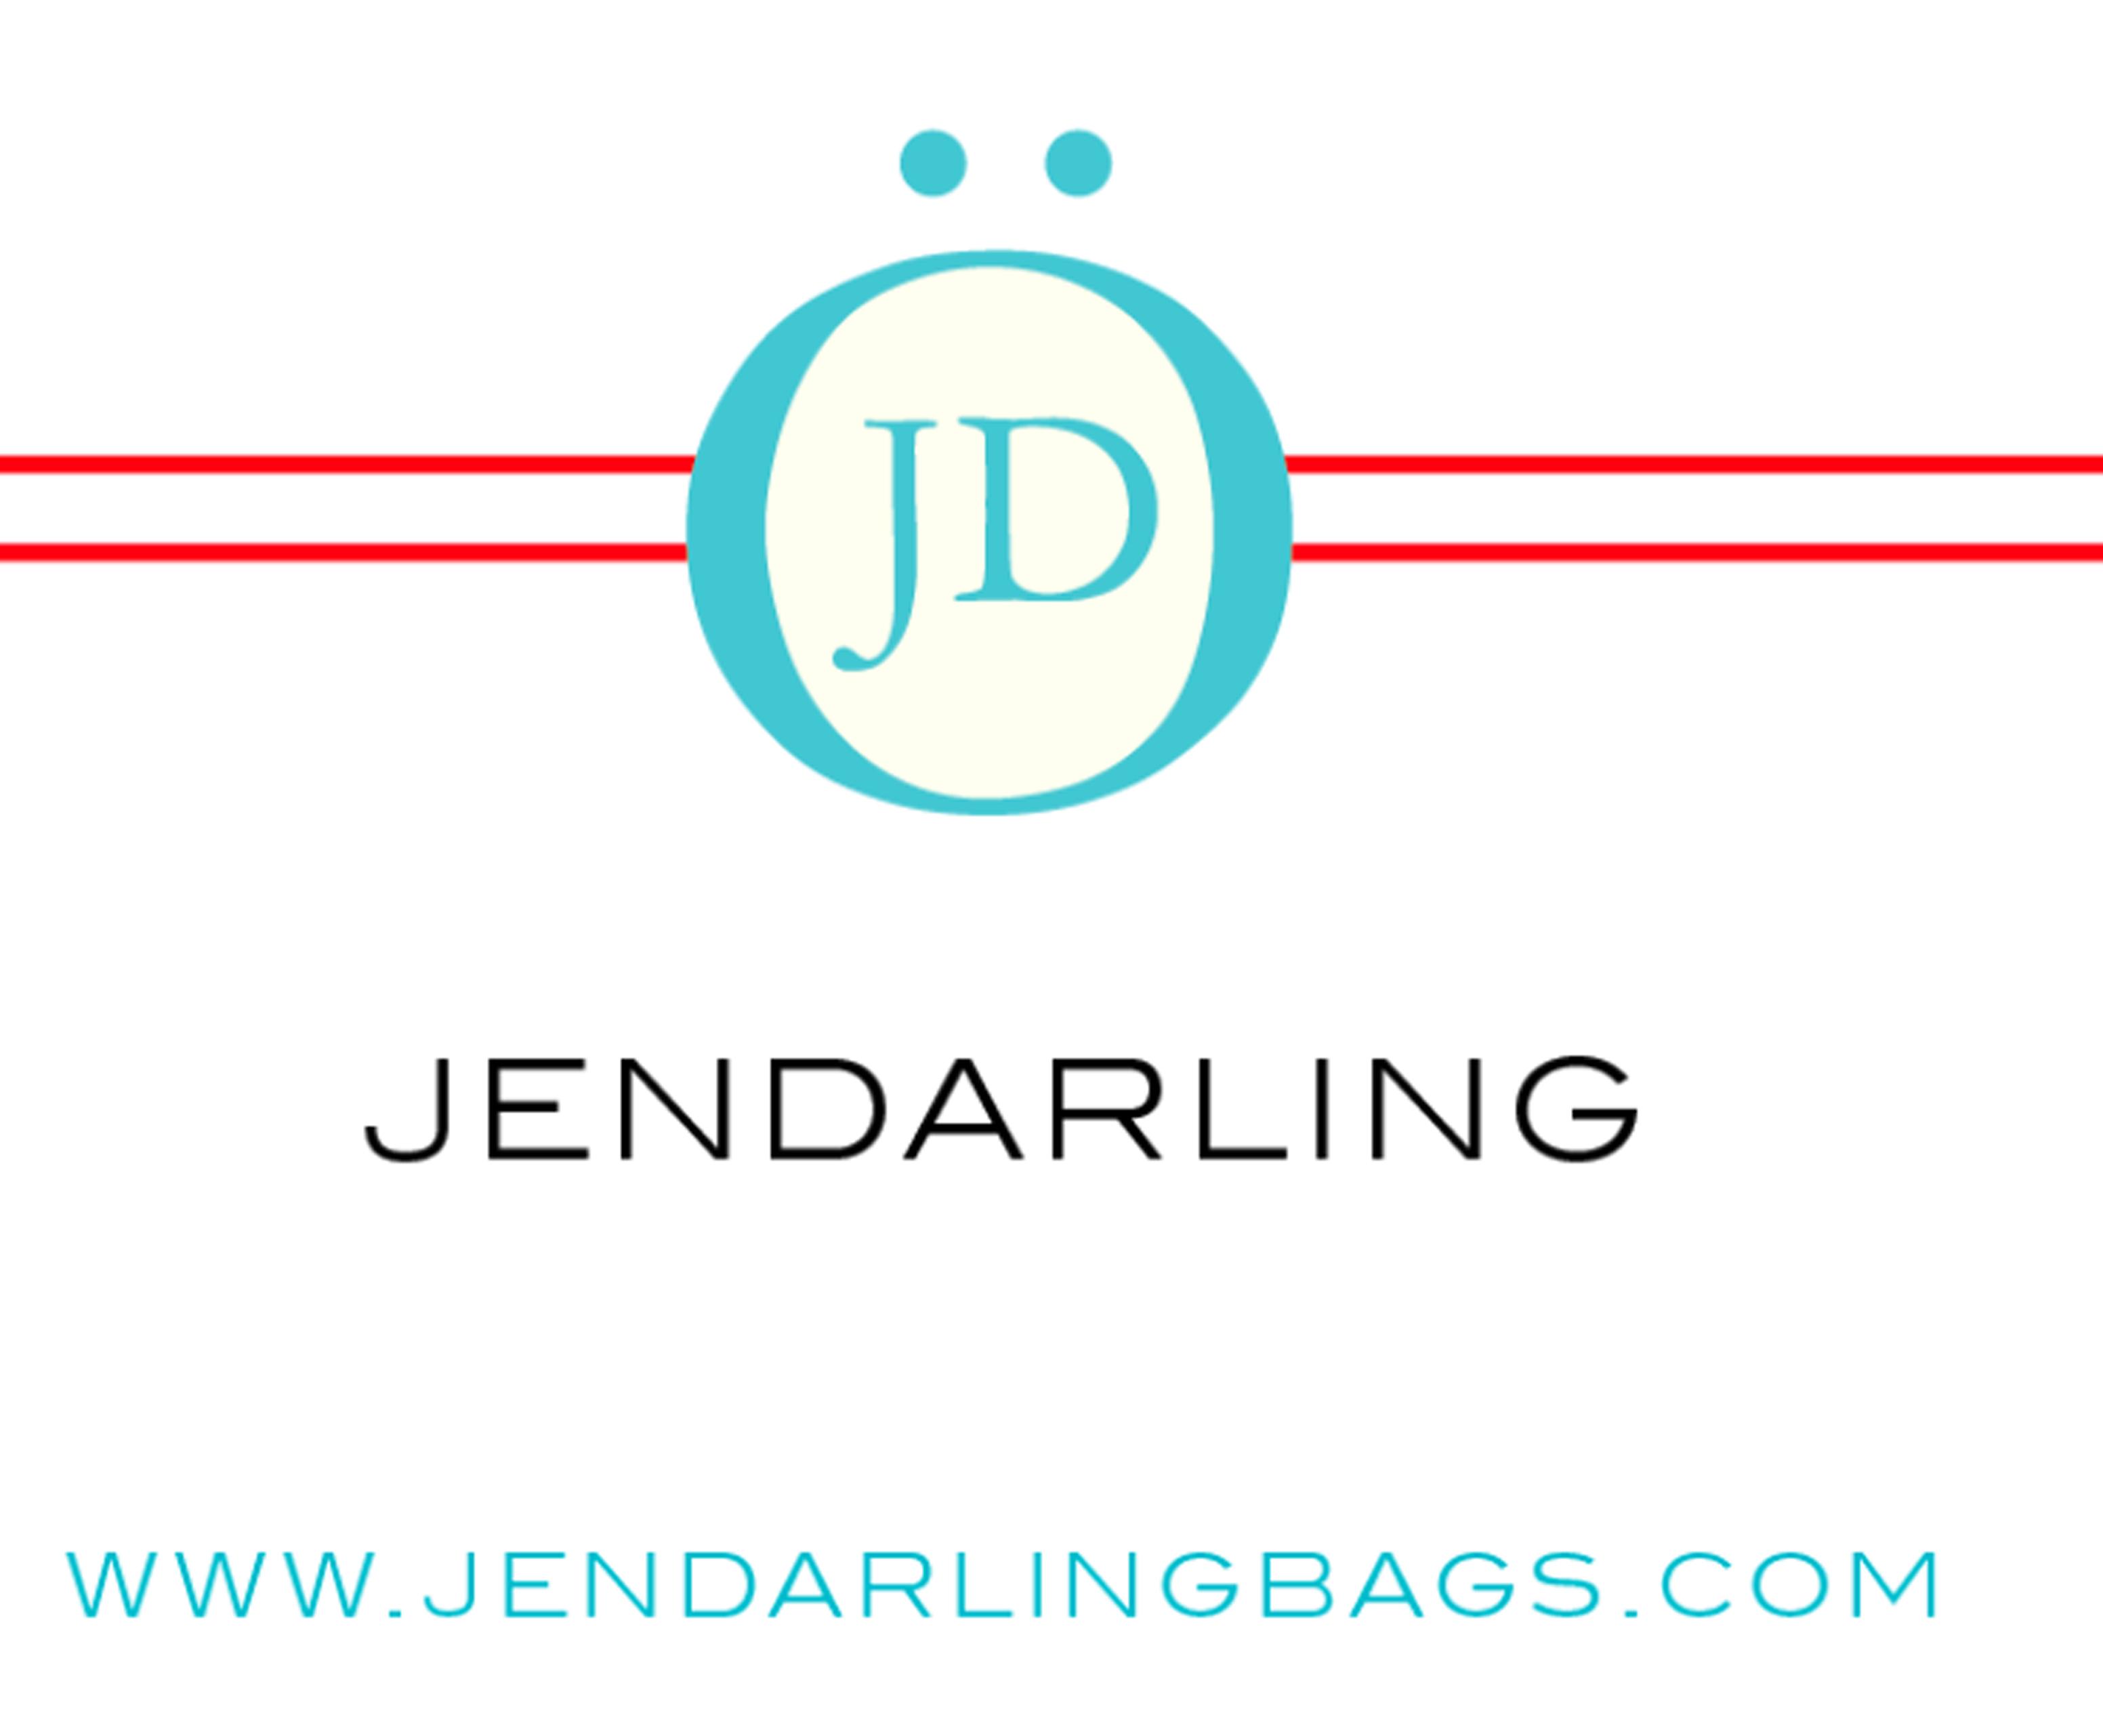 jendarling